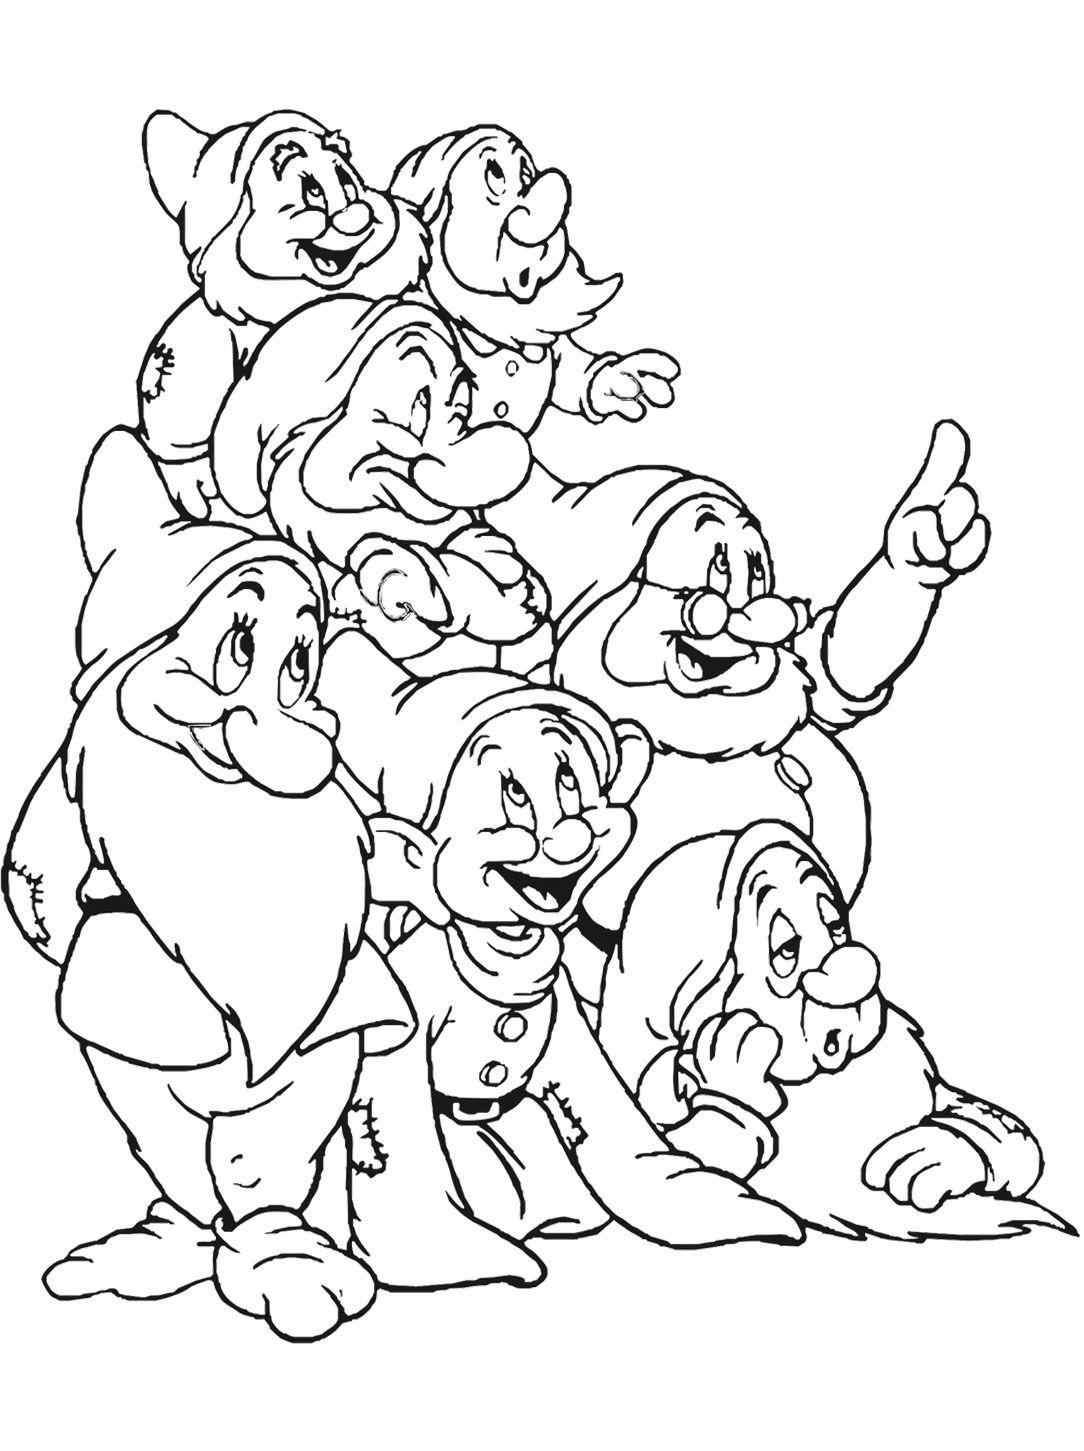 10 Coloriage 10 Nains Gratuit Beau  Snow white coloring pages